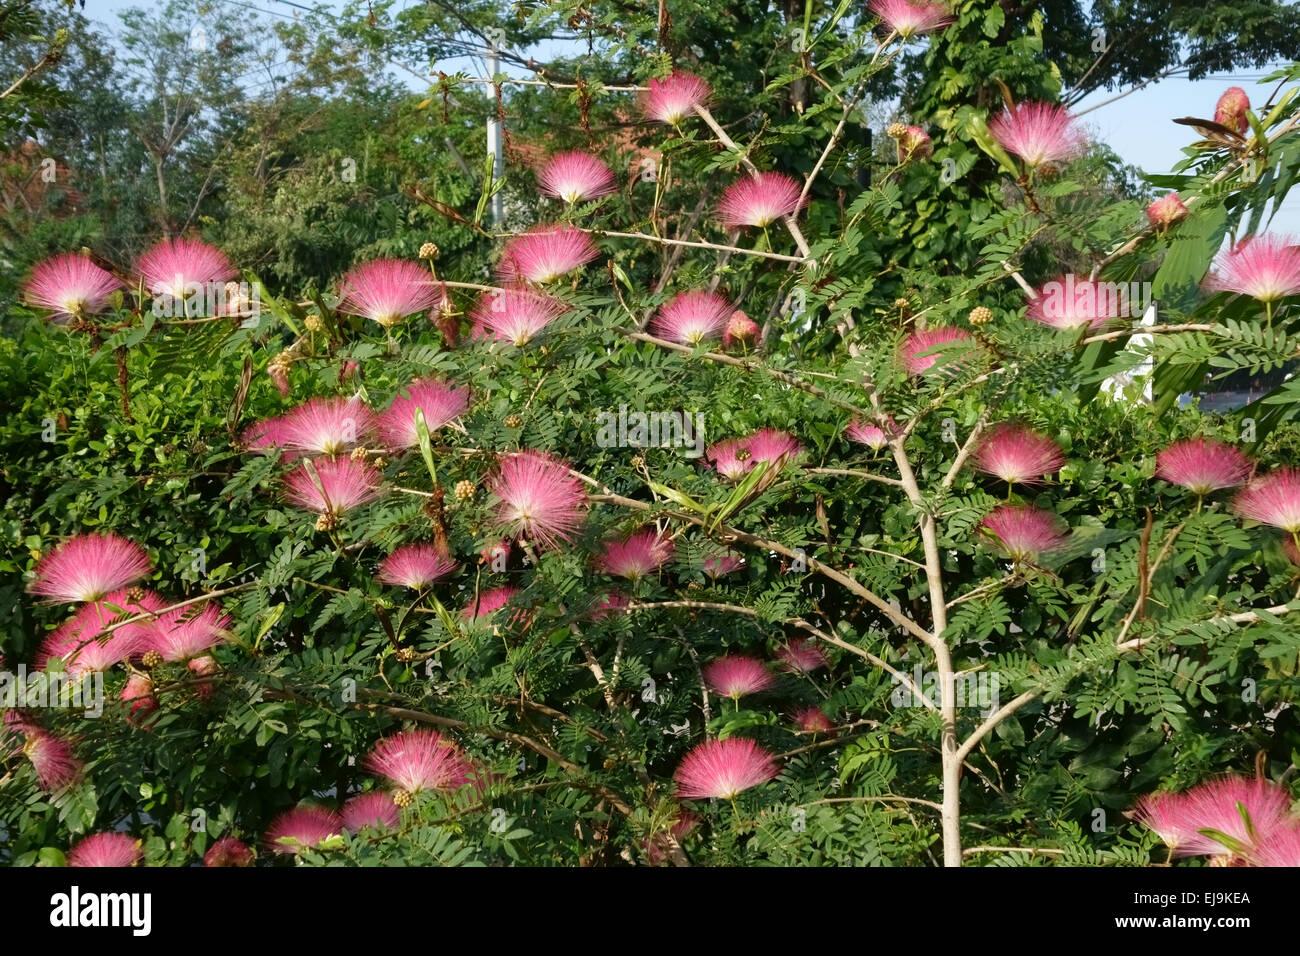 Pink silk tree persian silk tree or mimosa albizia julibrissin pink silk tree persian silk tree or mimosa albizia julibrissin flowers on a fast growing ornamental shrub nonthaburi thaila mightylinksfo